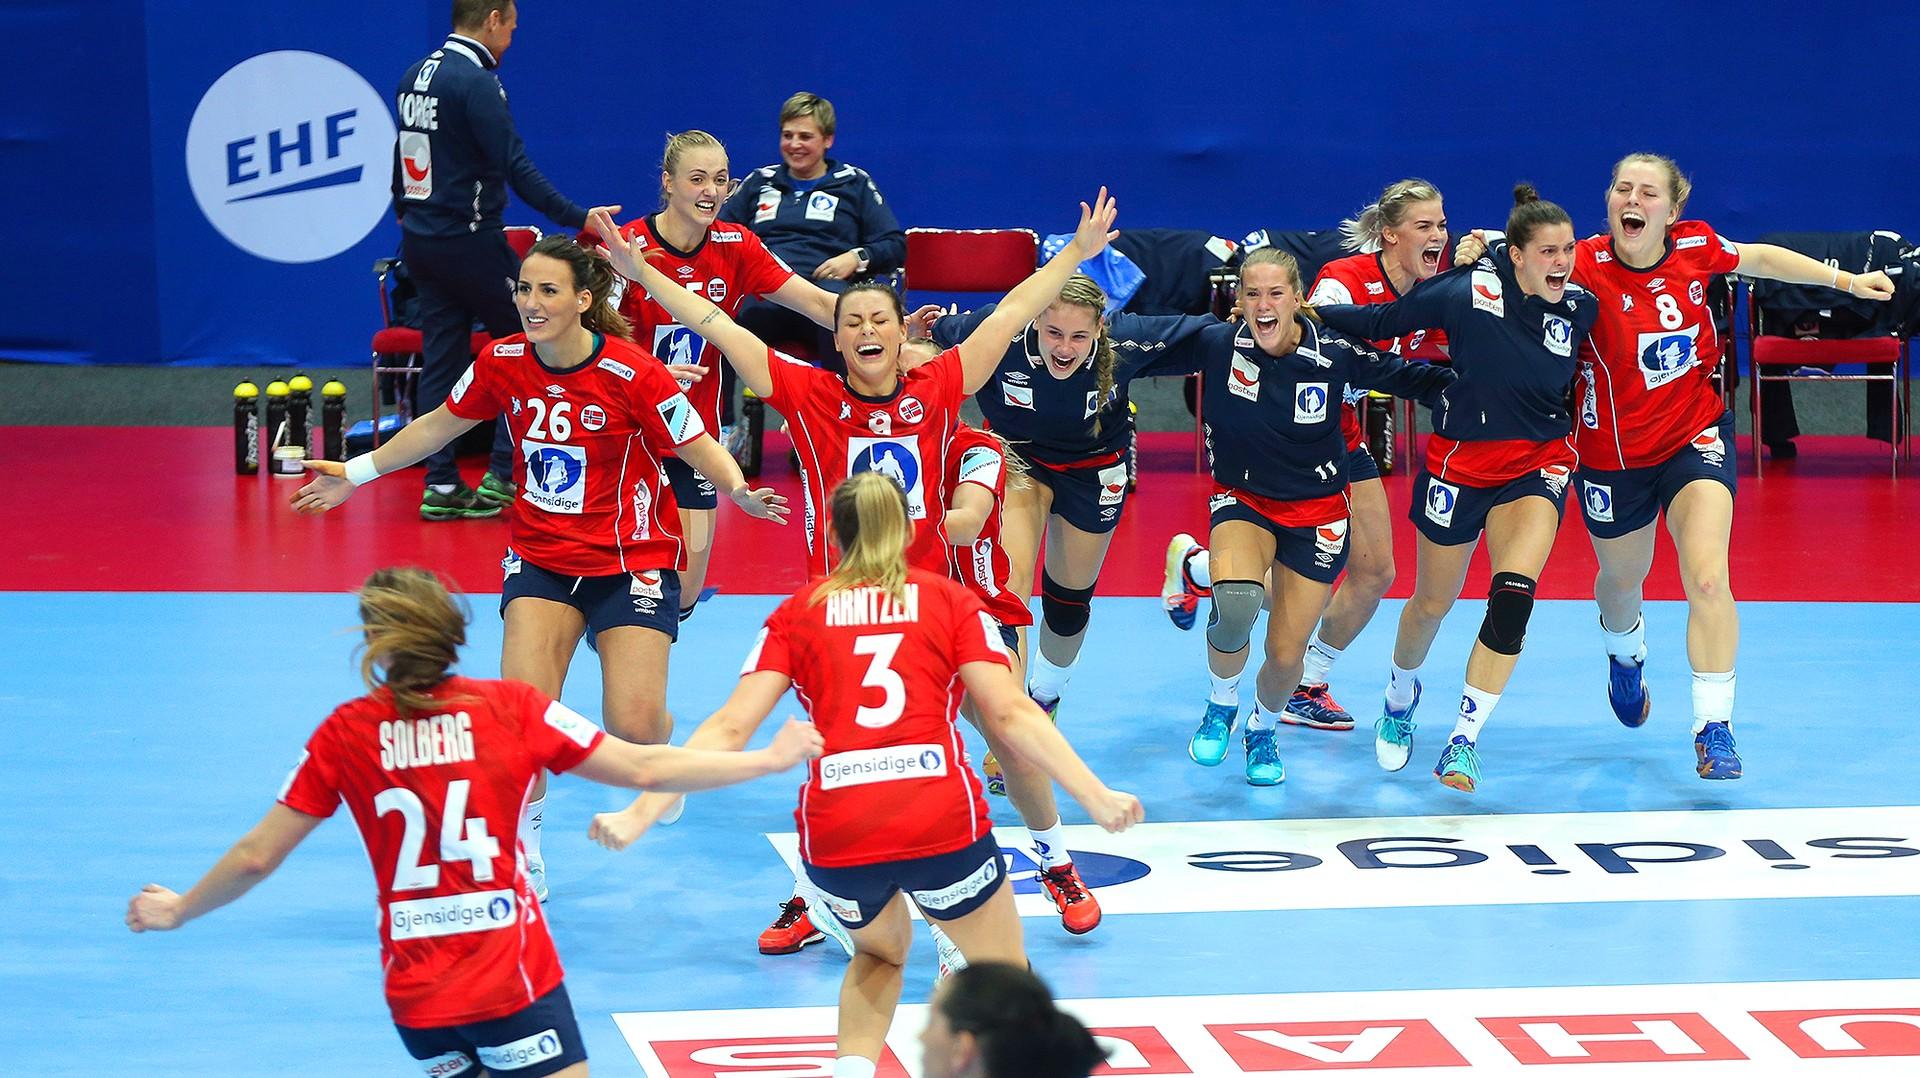 Håndball Vm 2019 Kvinner Resultater